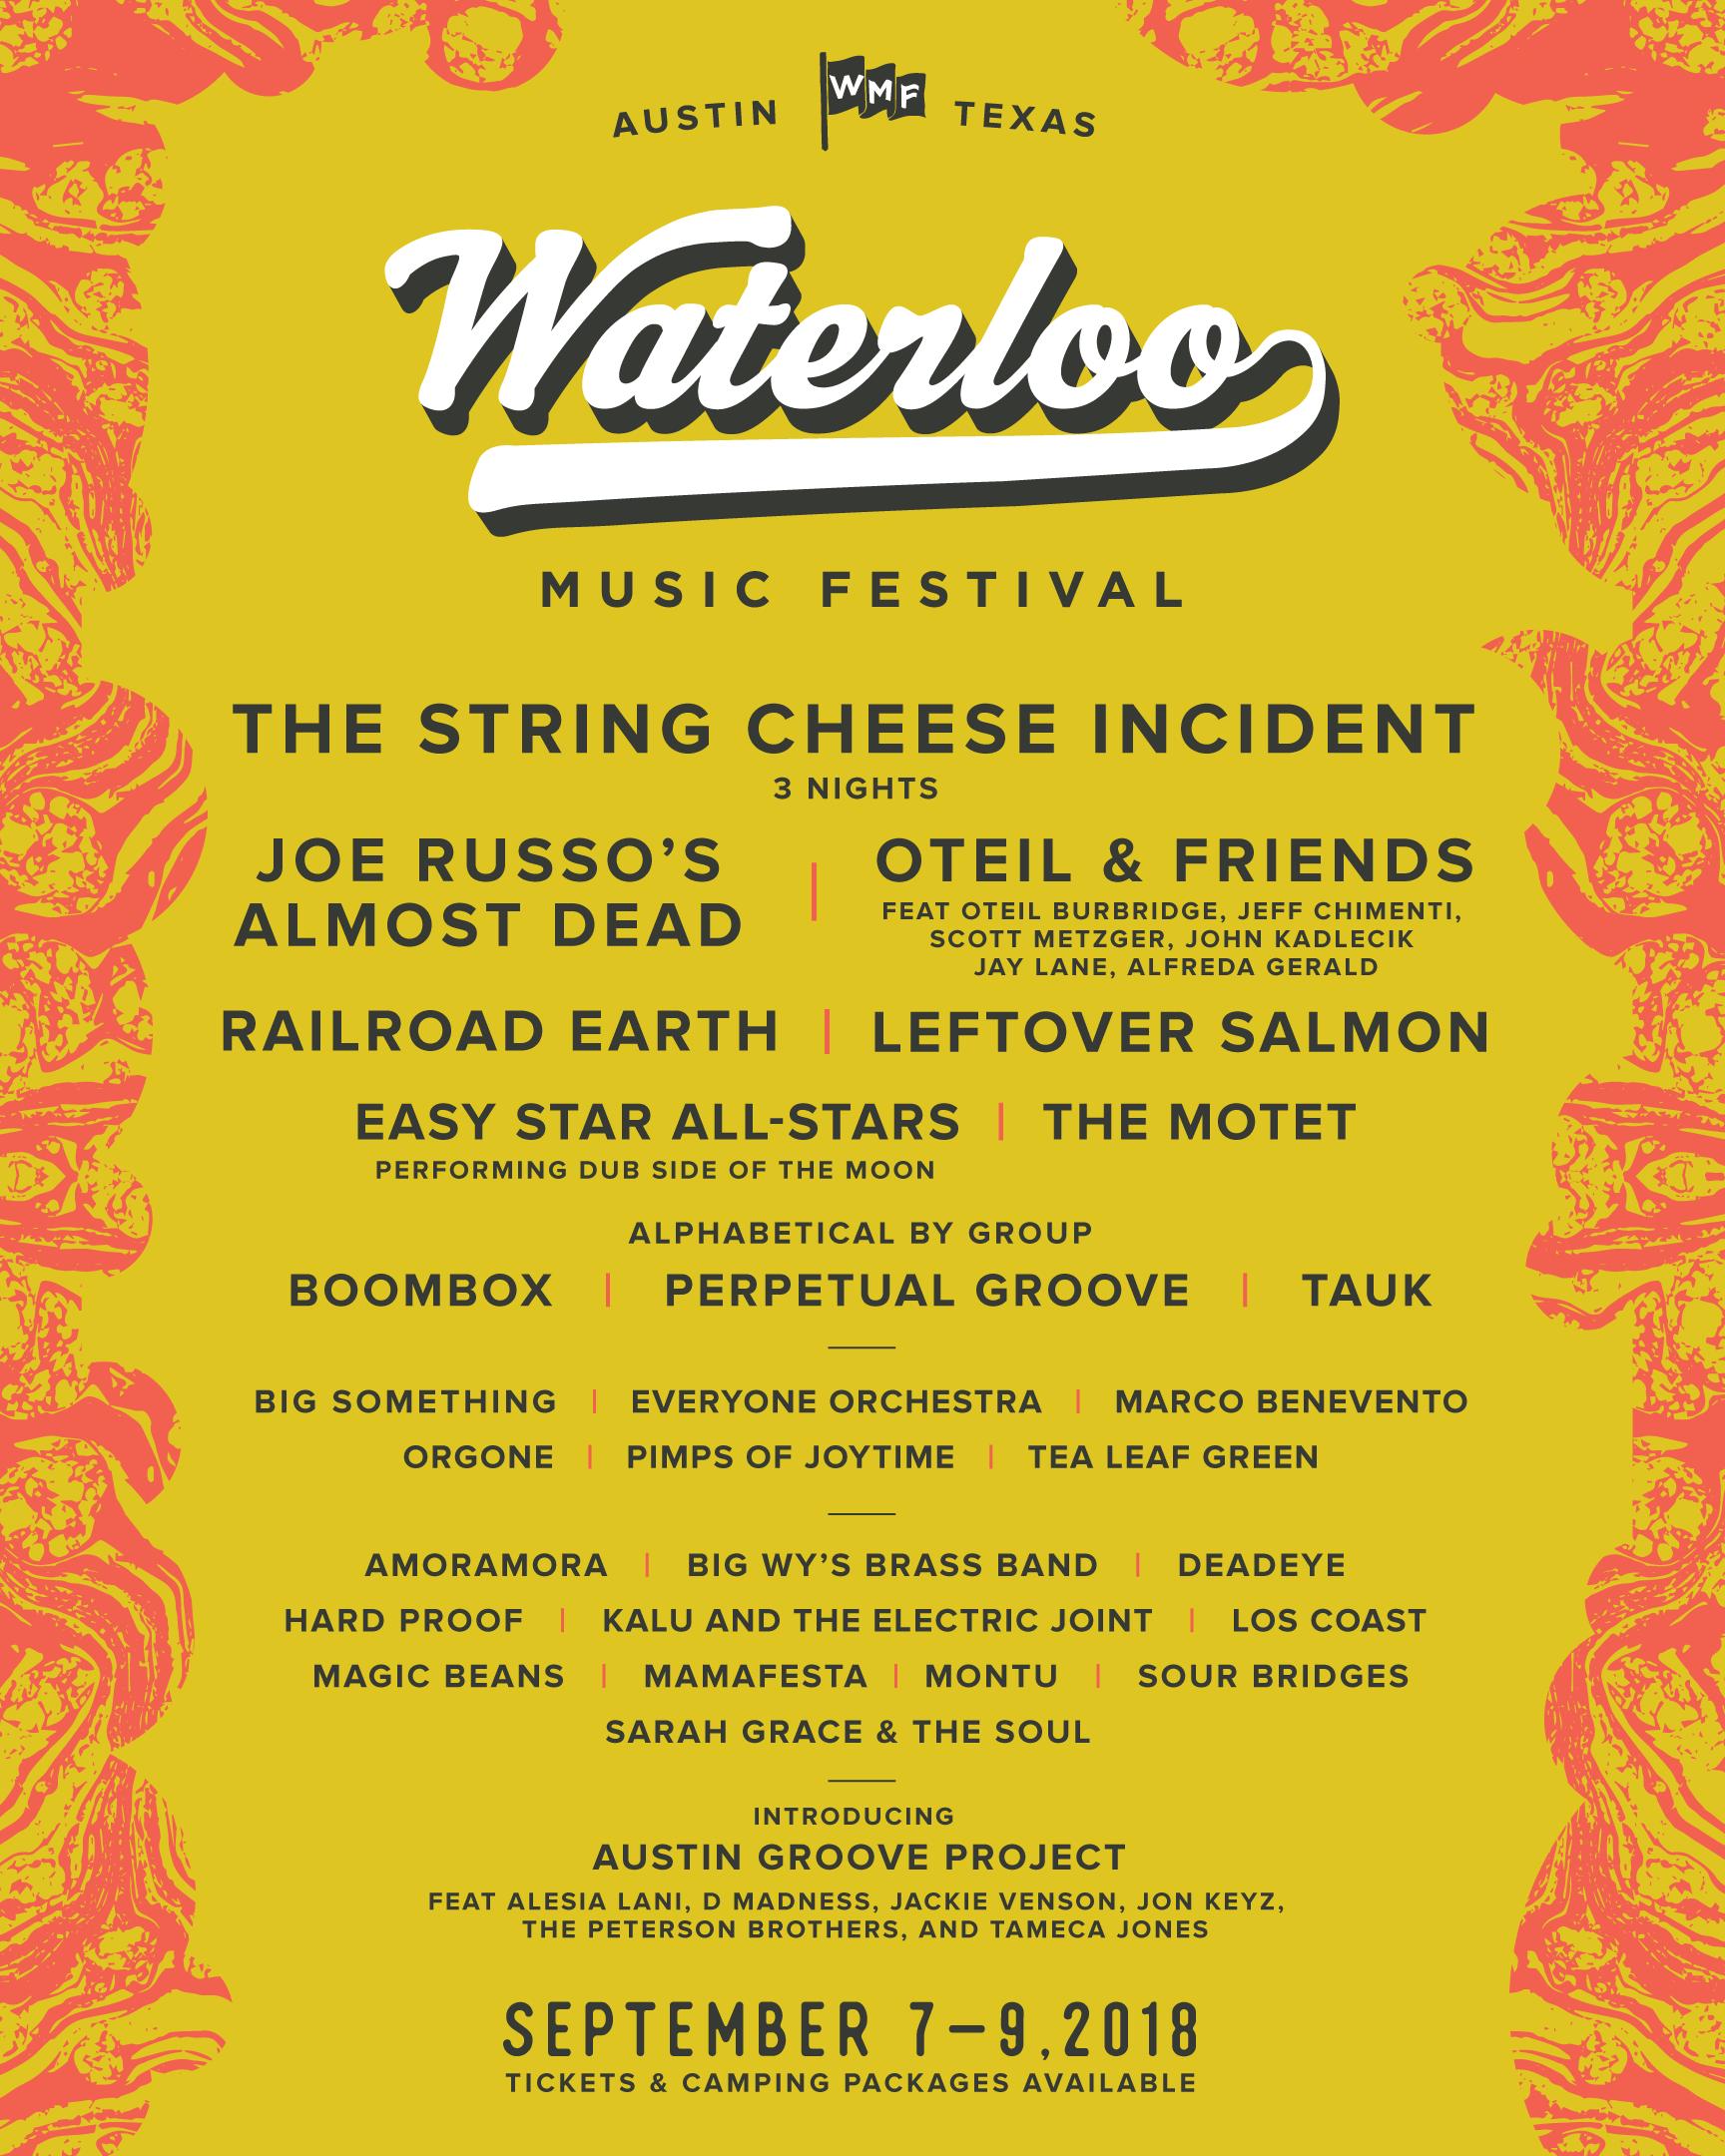 waterloo-lineup-final-4x5.png